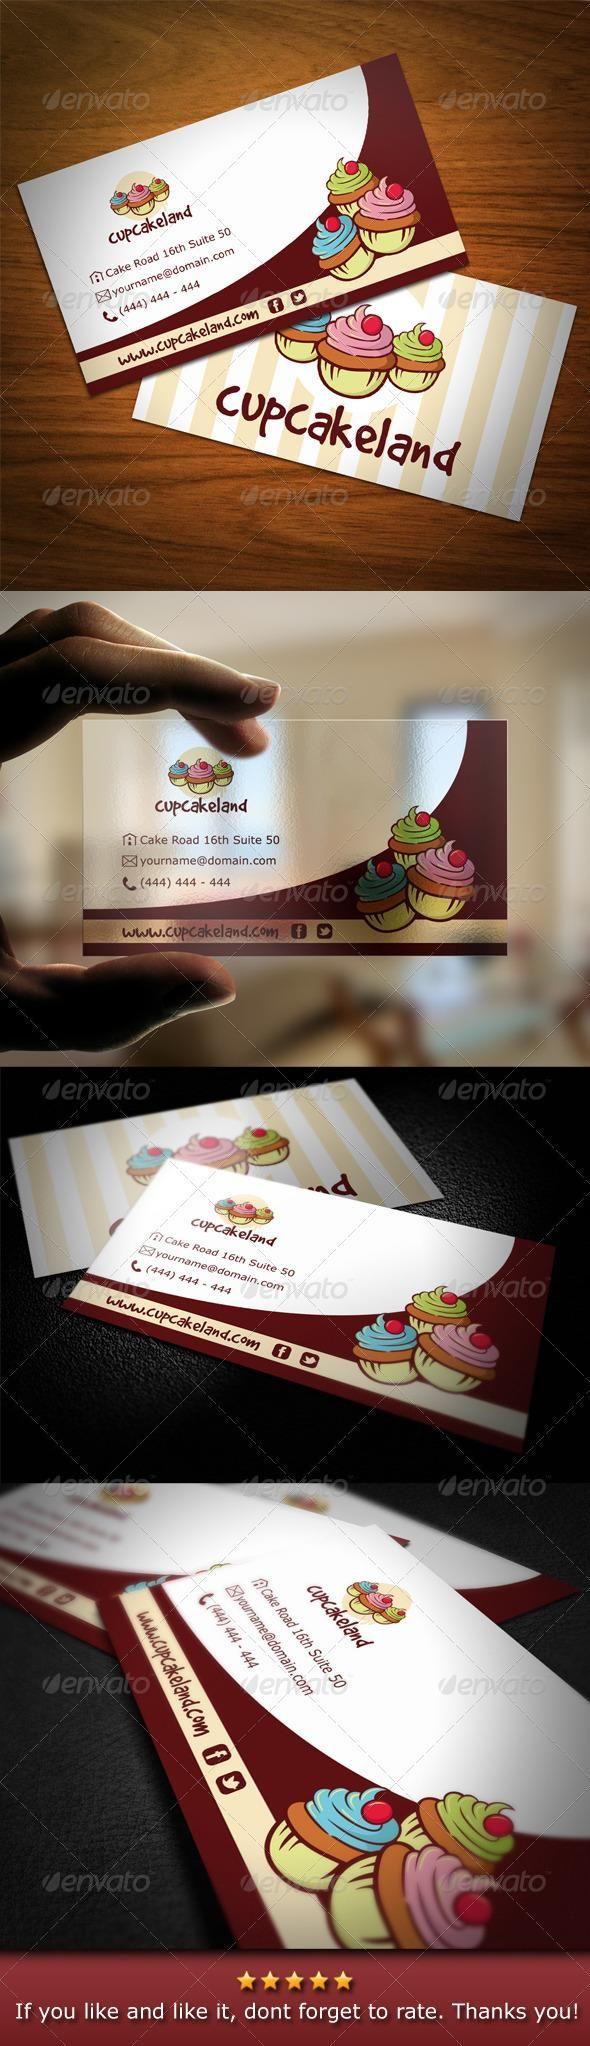 Cupcake Backery Business Card